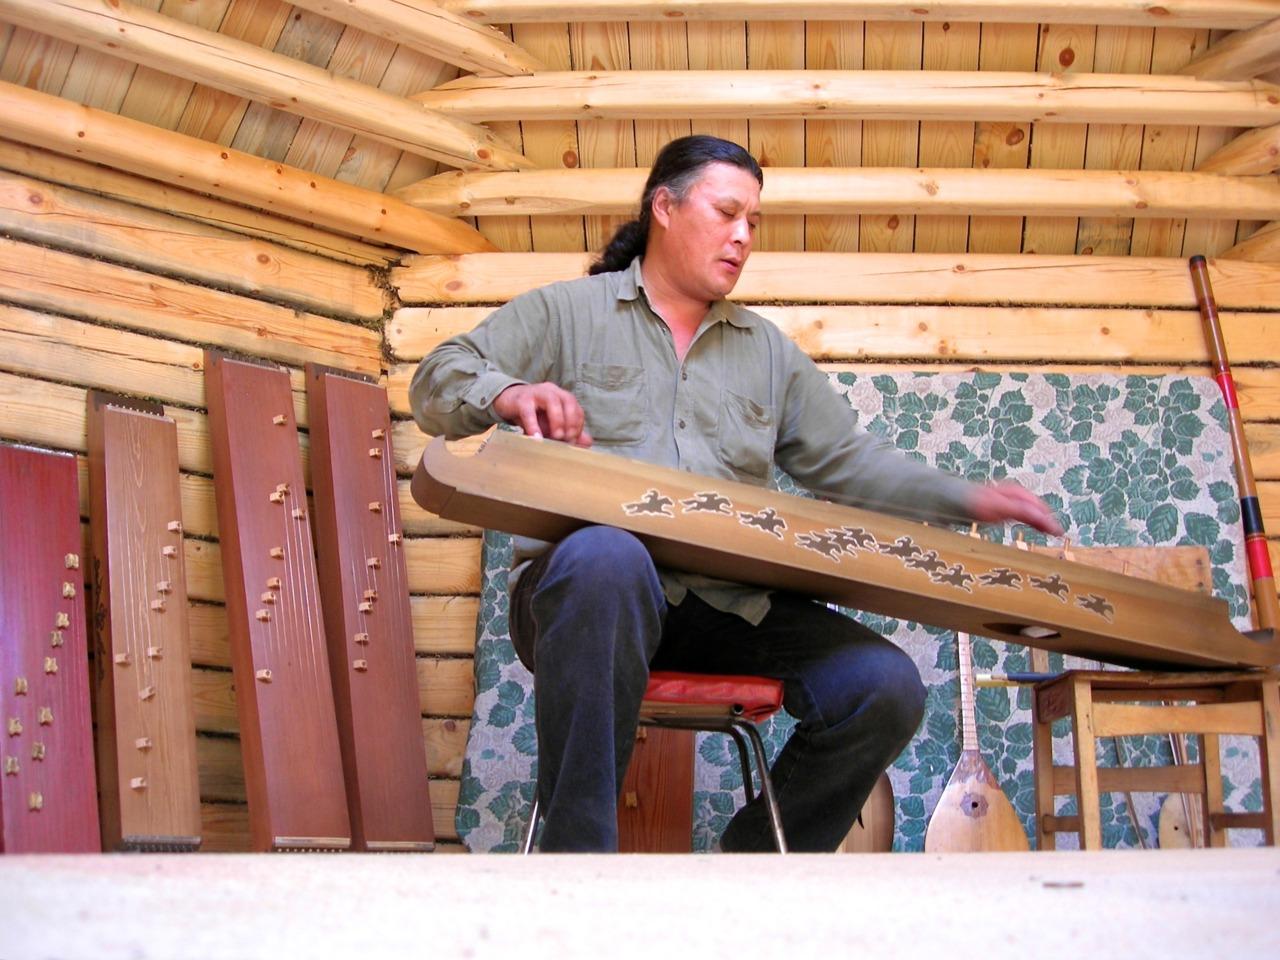 musician and master instrument builder sergei charkhov